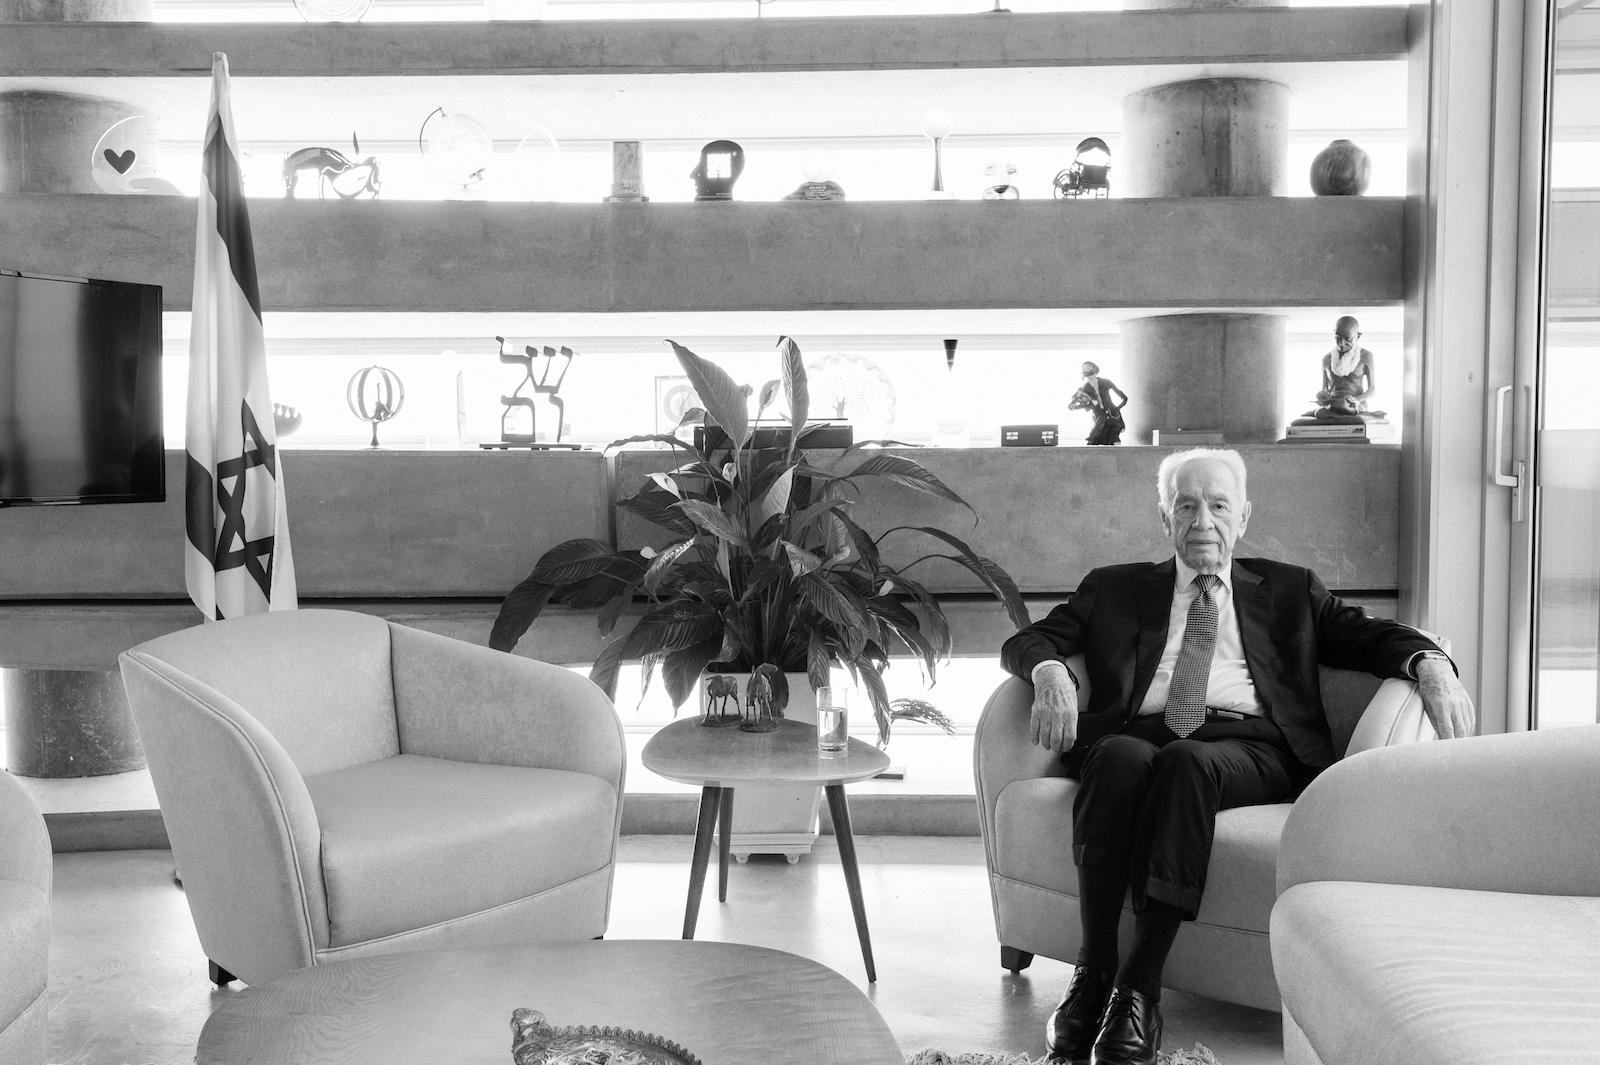 Shimon Peres, ehemaliger Staatspräsident und Friedensnobelpreisträger